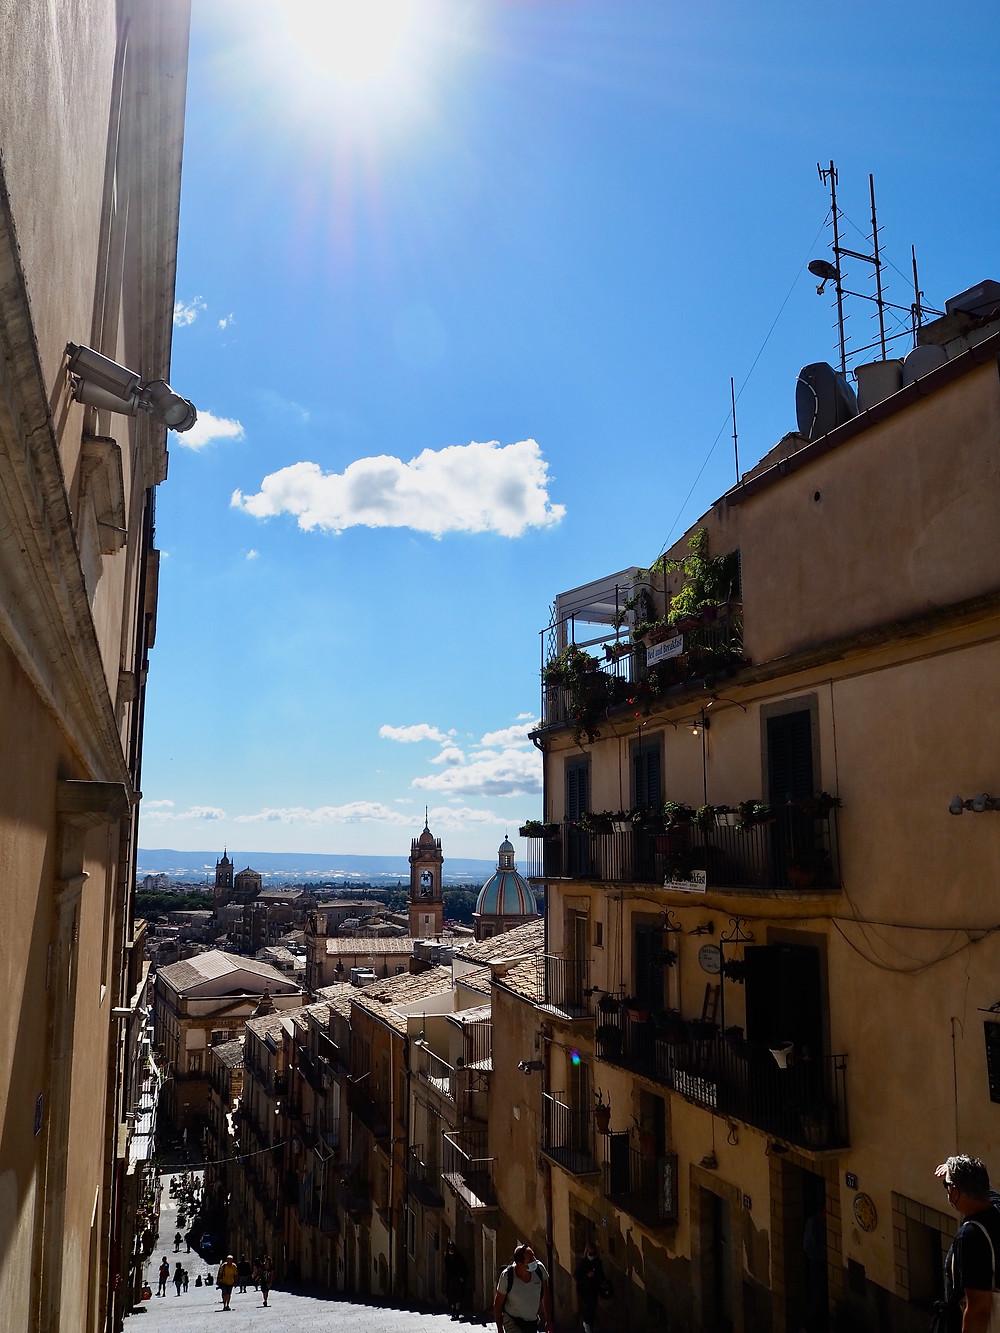 caltagirone-sicily-steps-7